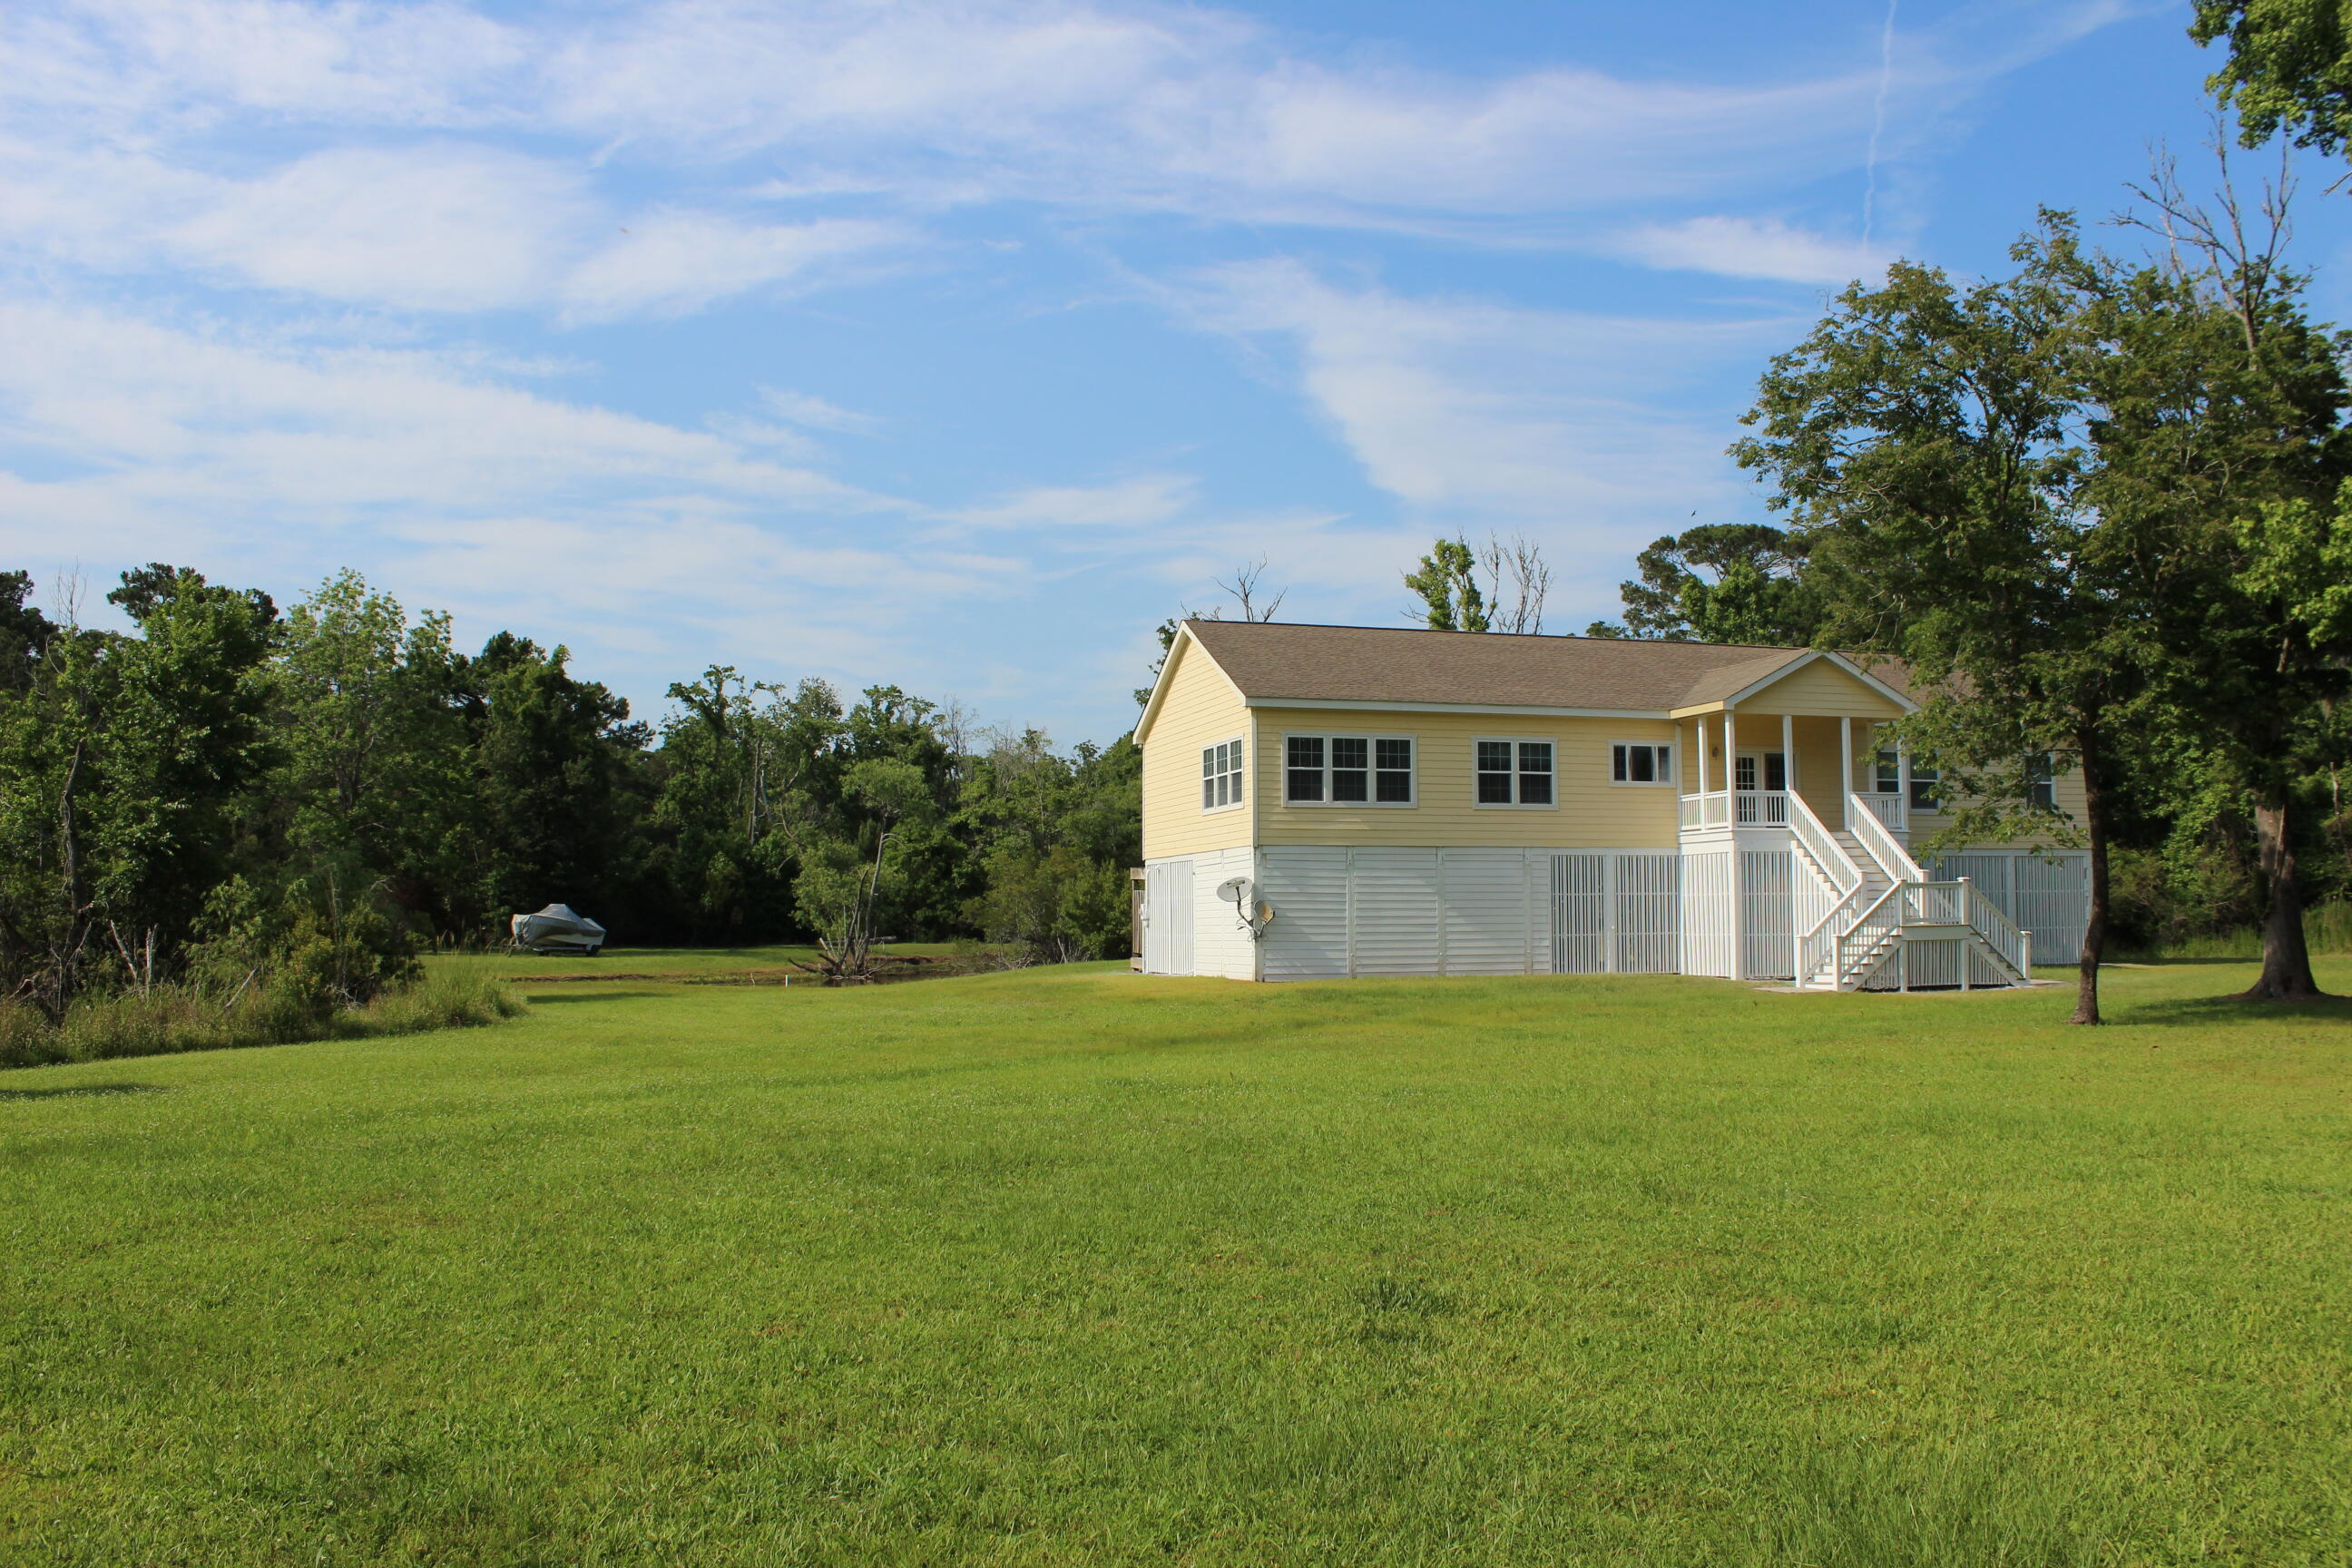 Edisto Island Homes For Sale - 8184 Oyster Factory, Edisto Island, SC - 16